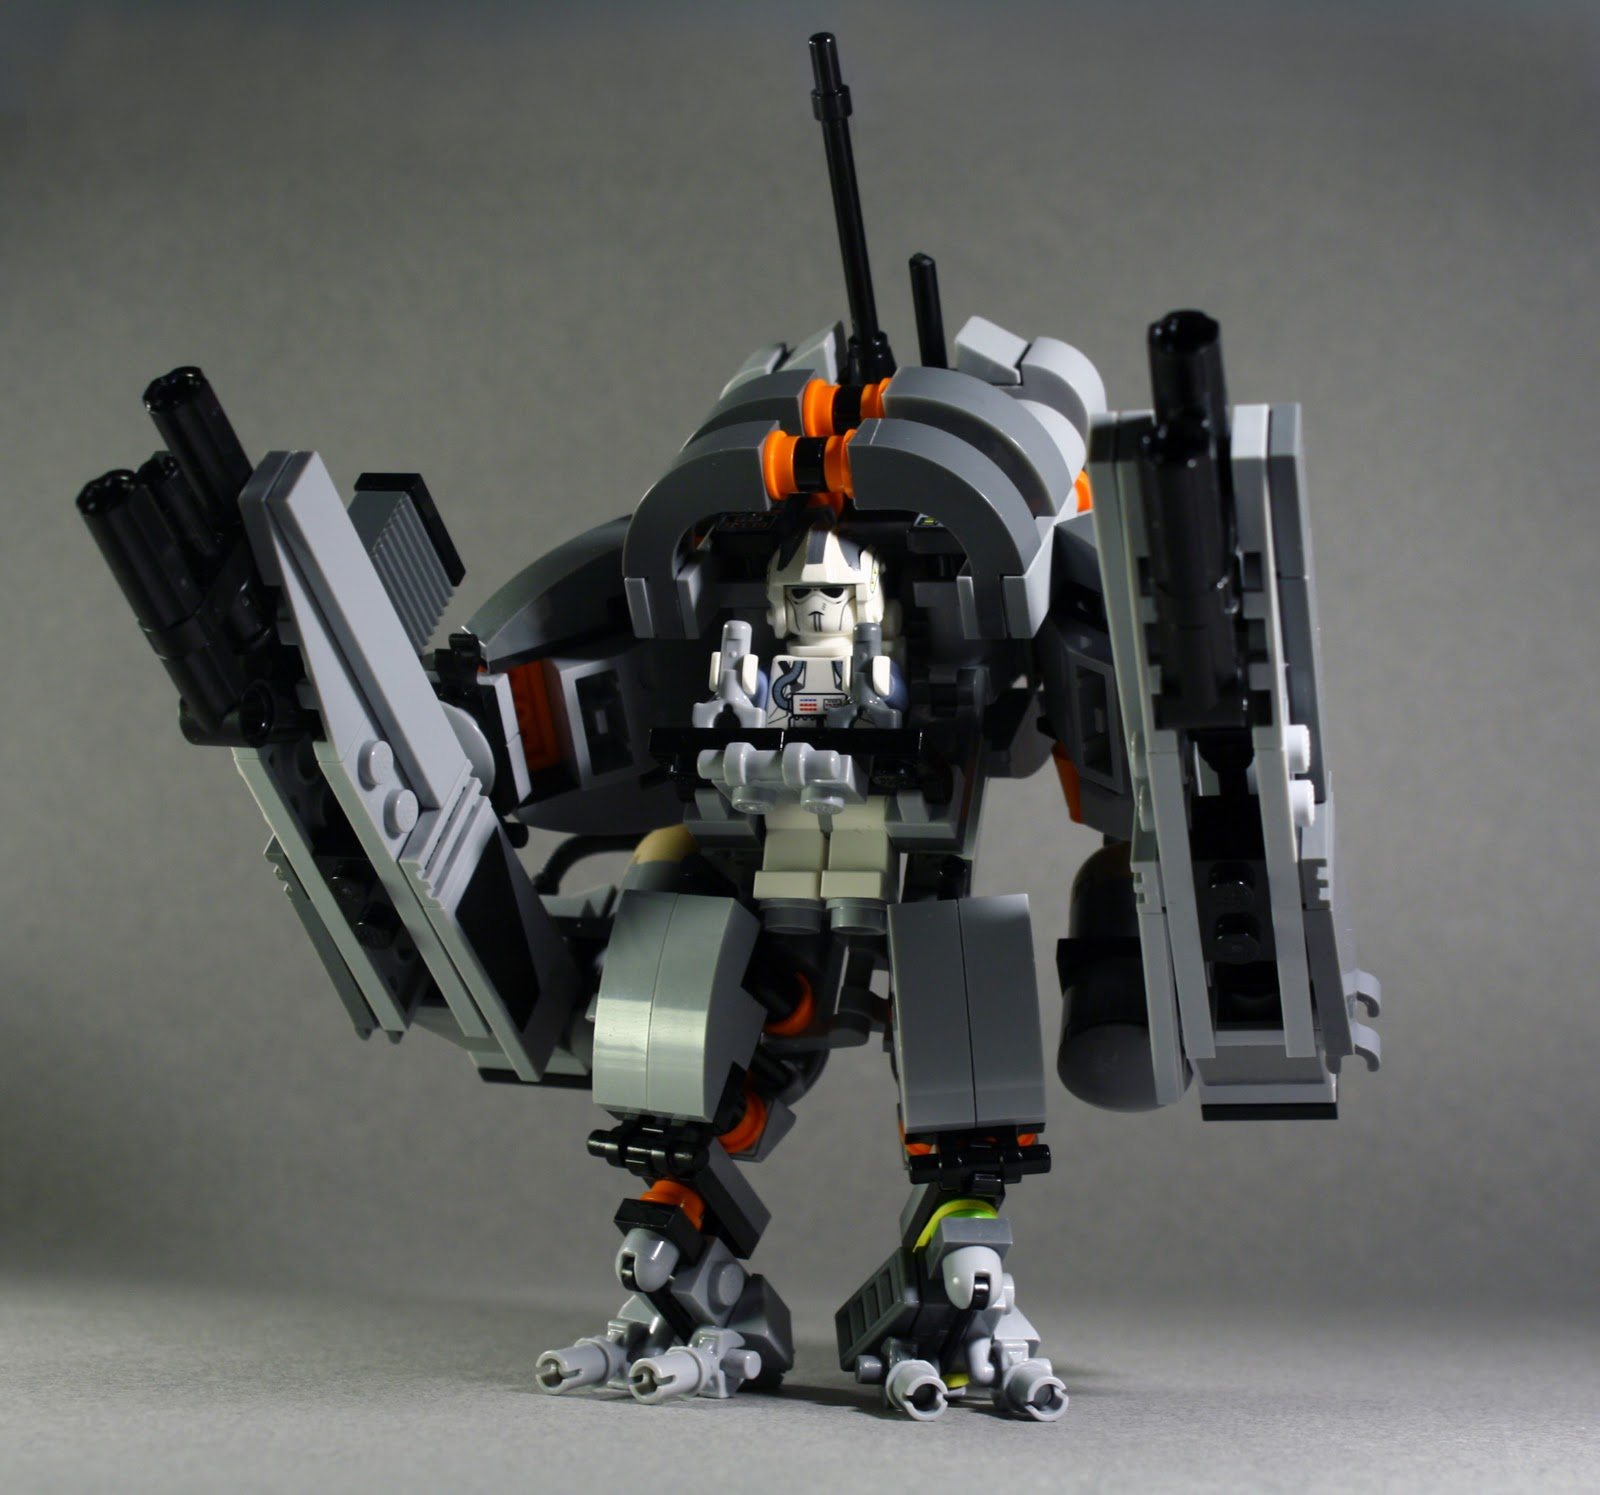 Markiepo0's Lego Blog: My First Lego Mech